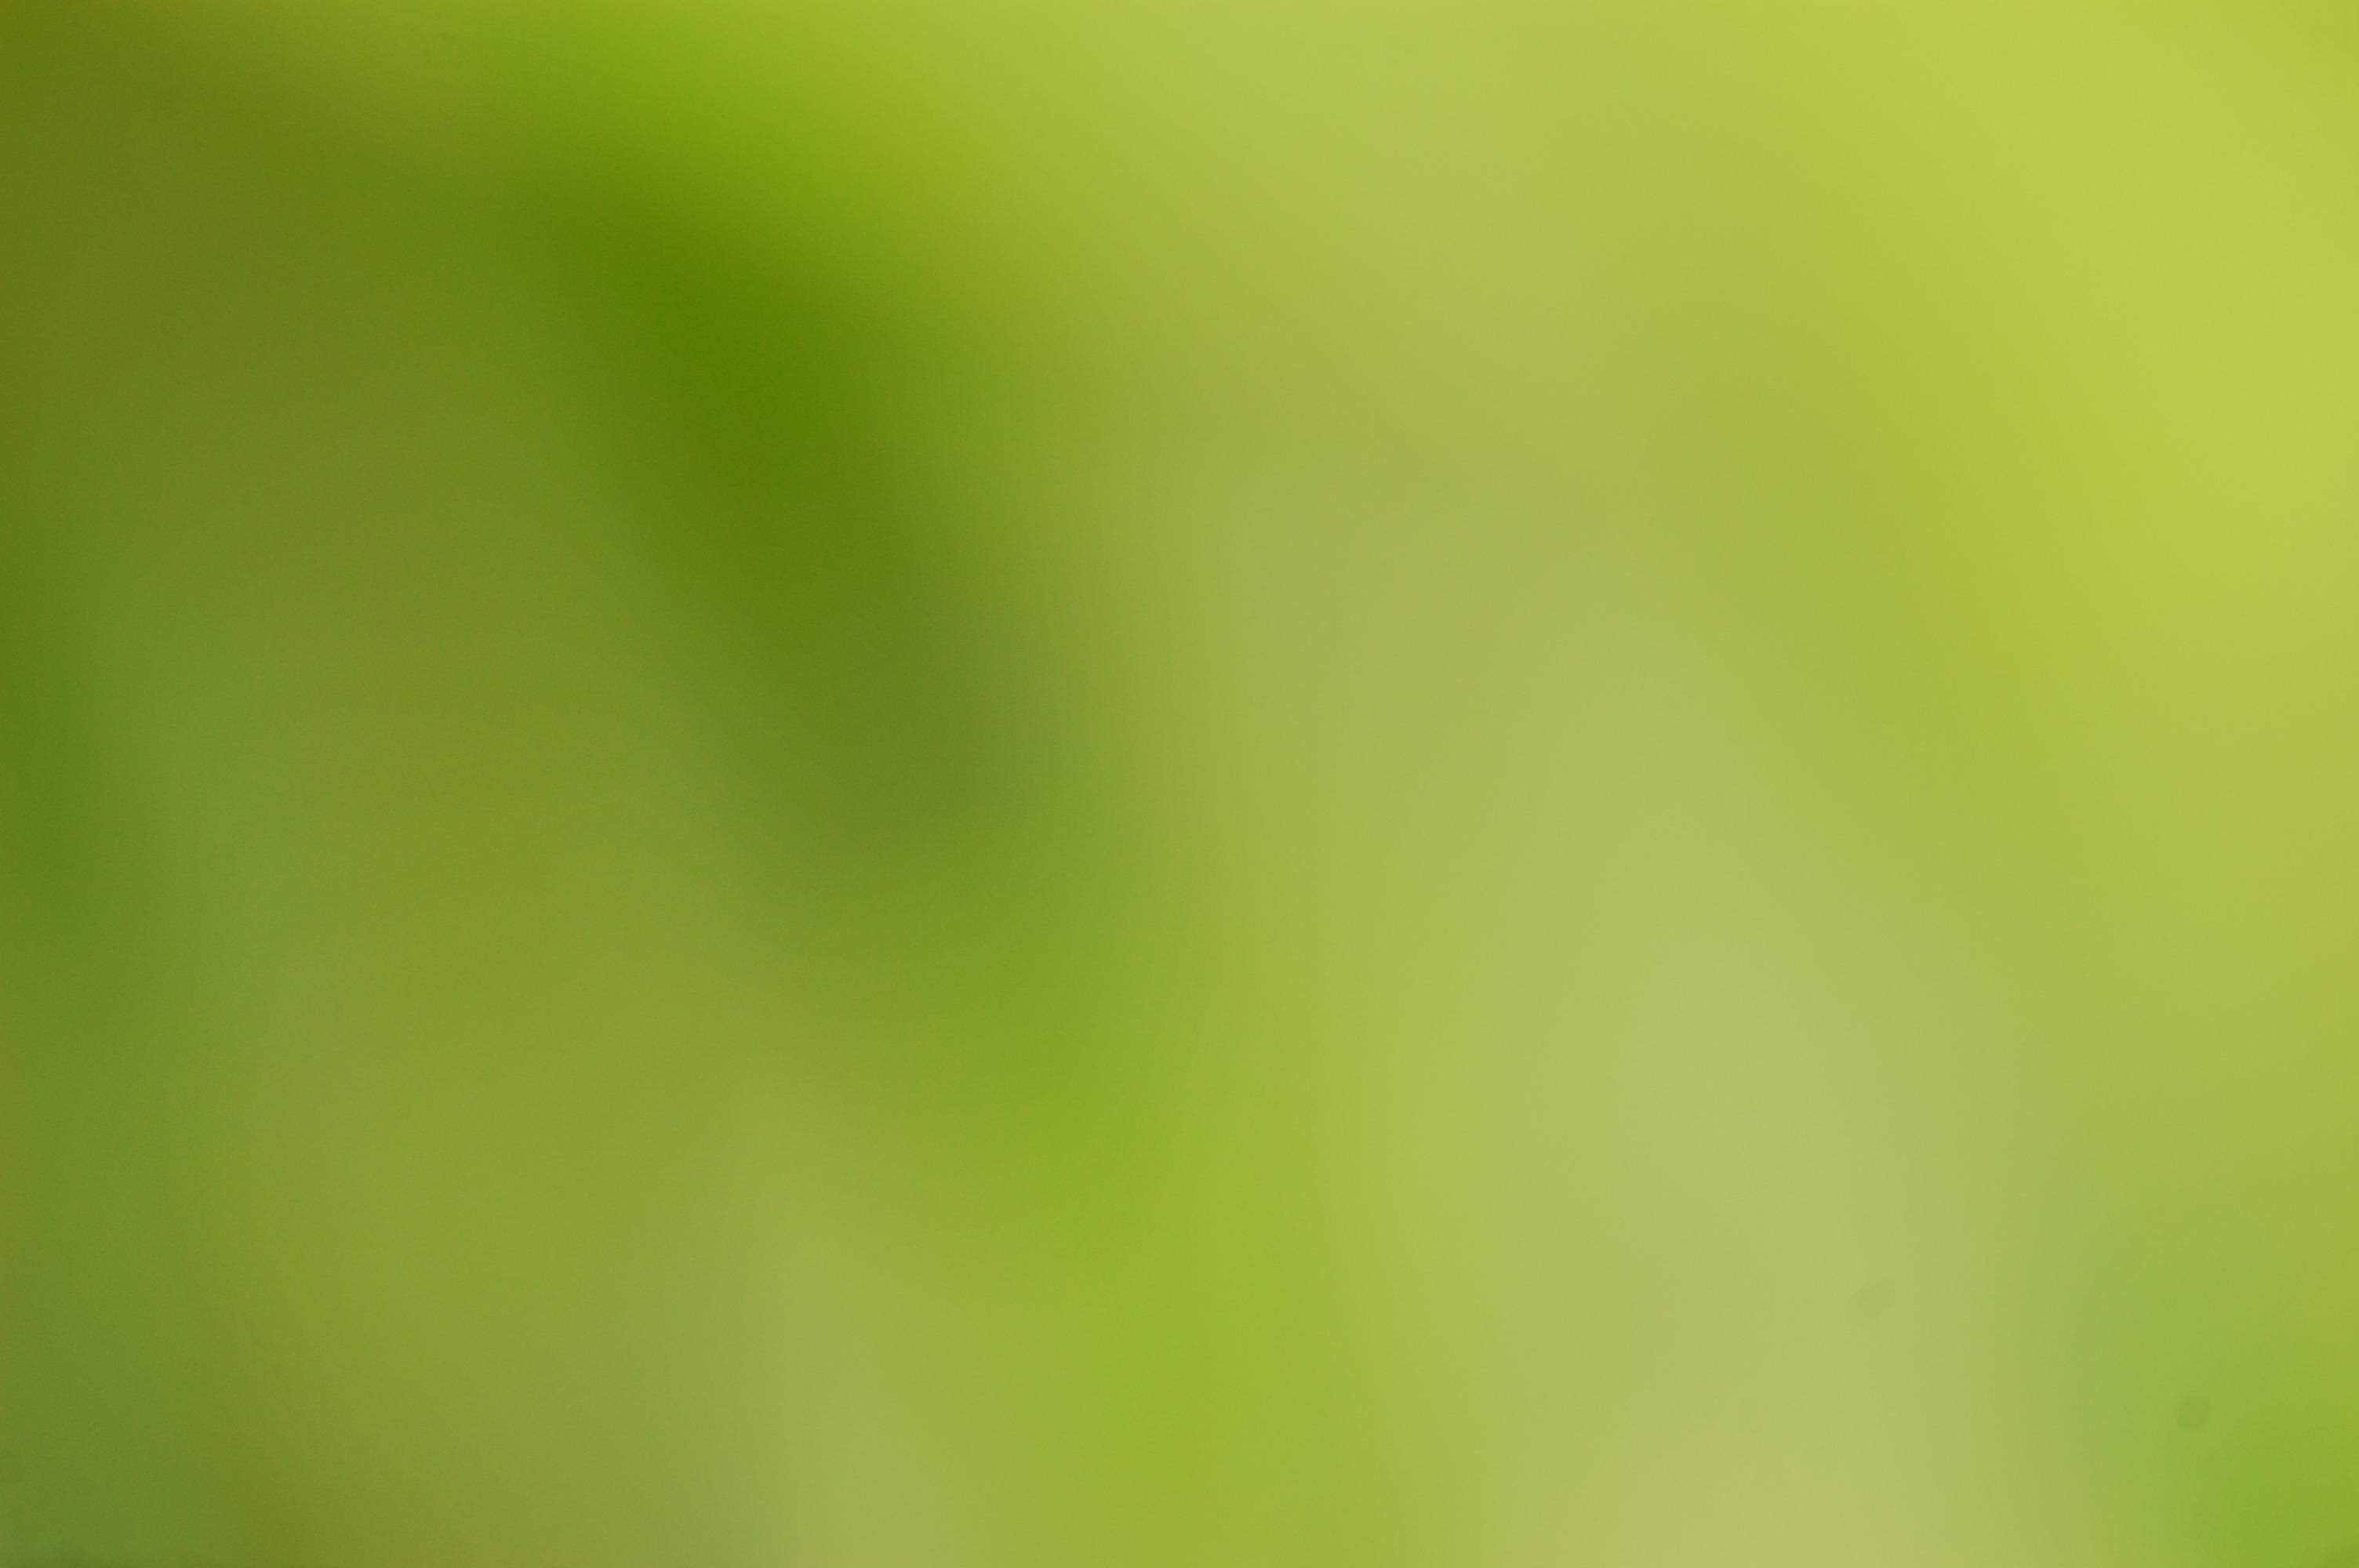 Free Images : nature, light, blur, plant, sunlight, leaf, line ...